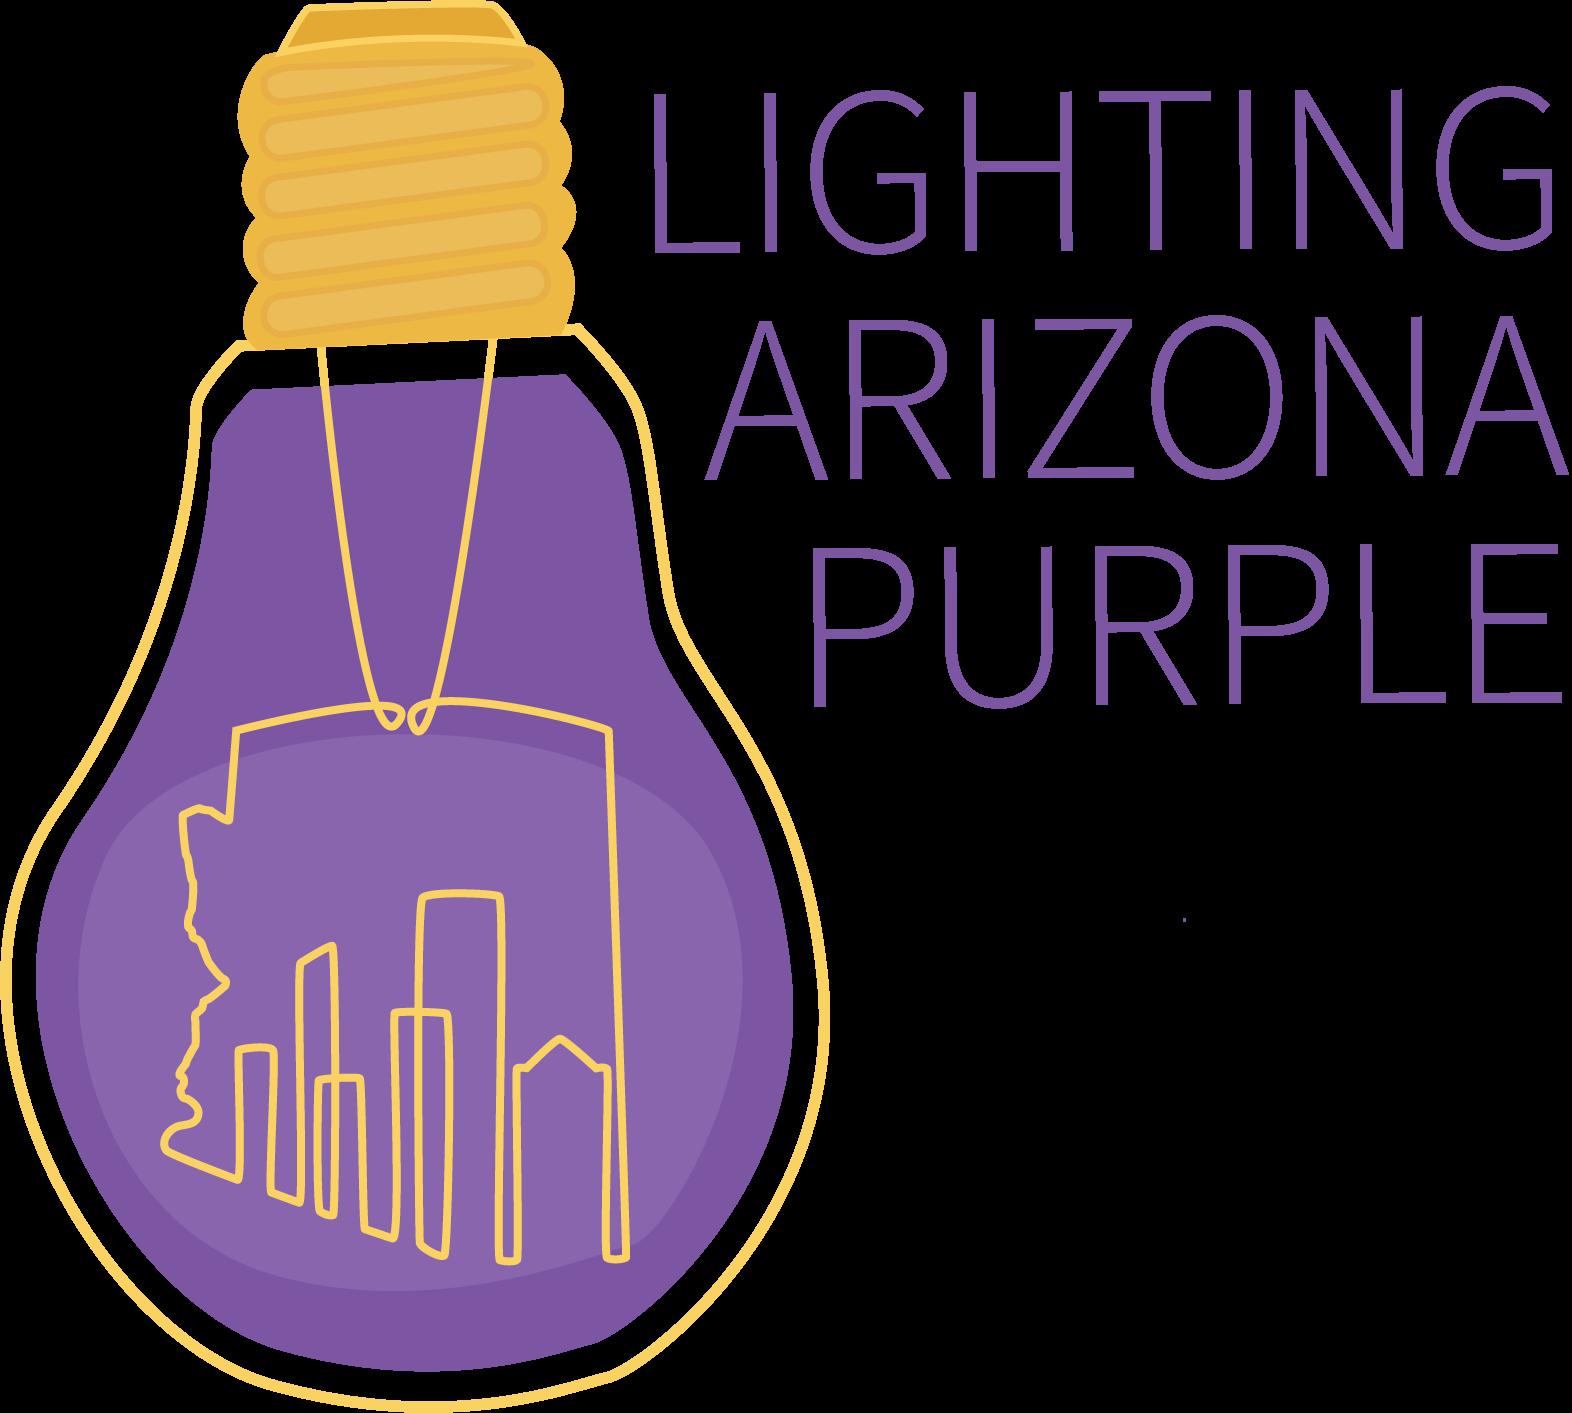 Domestic-violence awareness 2nd Annual Lighting Arizona Purple kickoff event Monday  sc 1 st  AZCentral.com & Domestic-violence awareness: 2nd Annual Lighting Arizona Purple ...